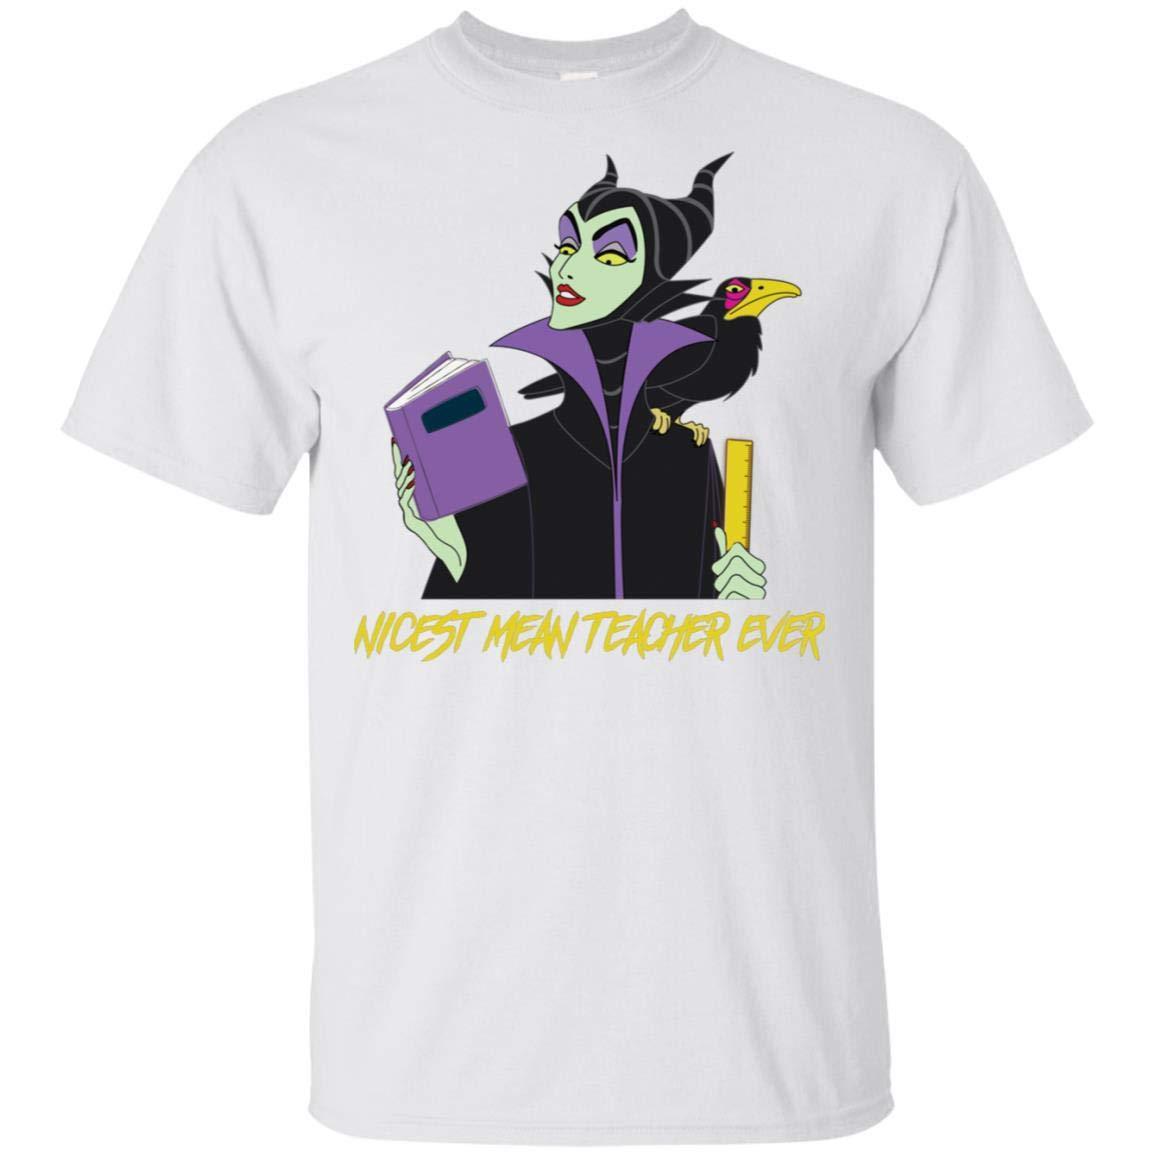 Maleficent Nicest Mean Tea Ever Shirt T Shirt For T Shirt For Sweatshir